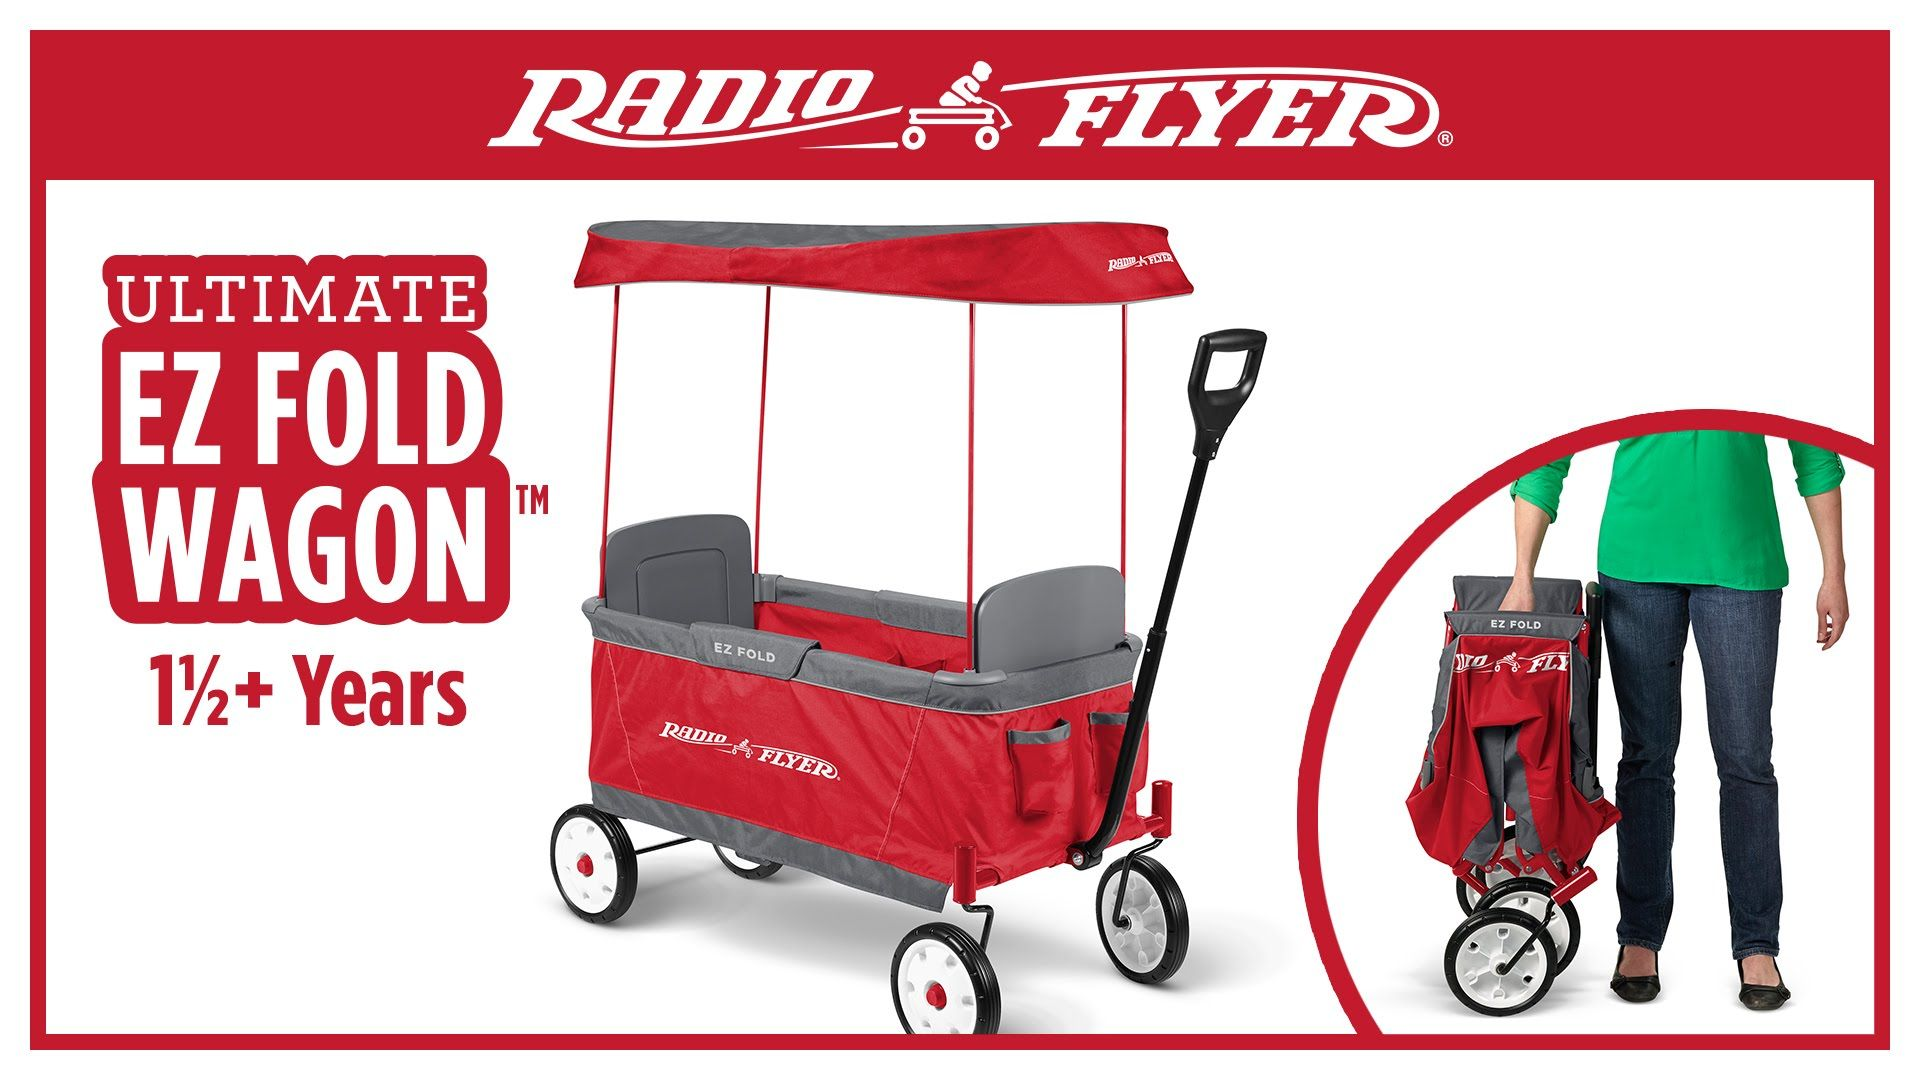 Radio Flyer Ultimate EZ Fold Wagon™ This Wagon looks very